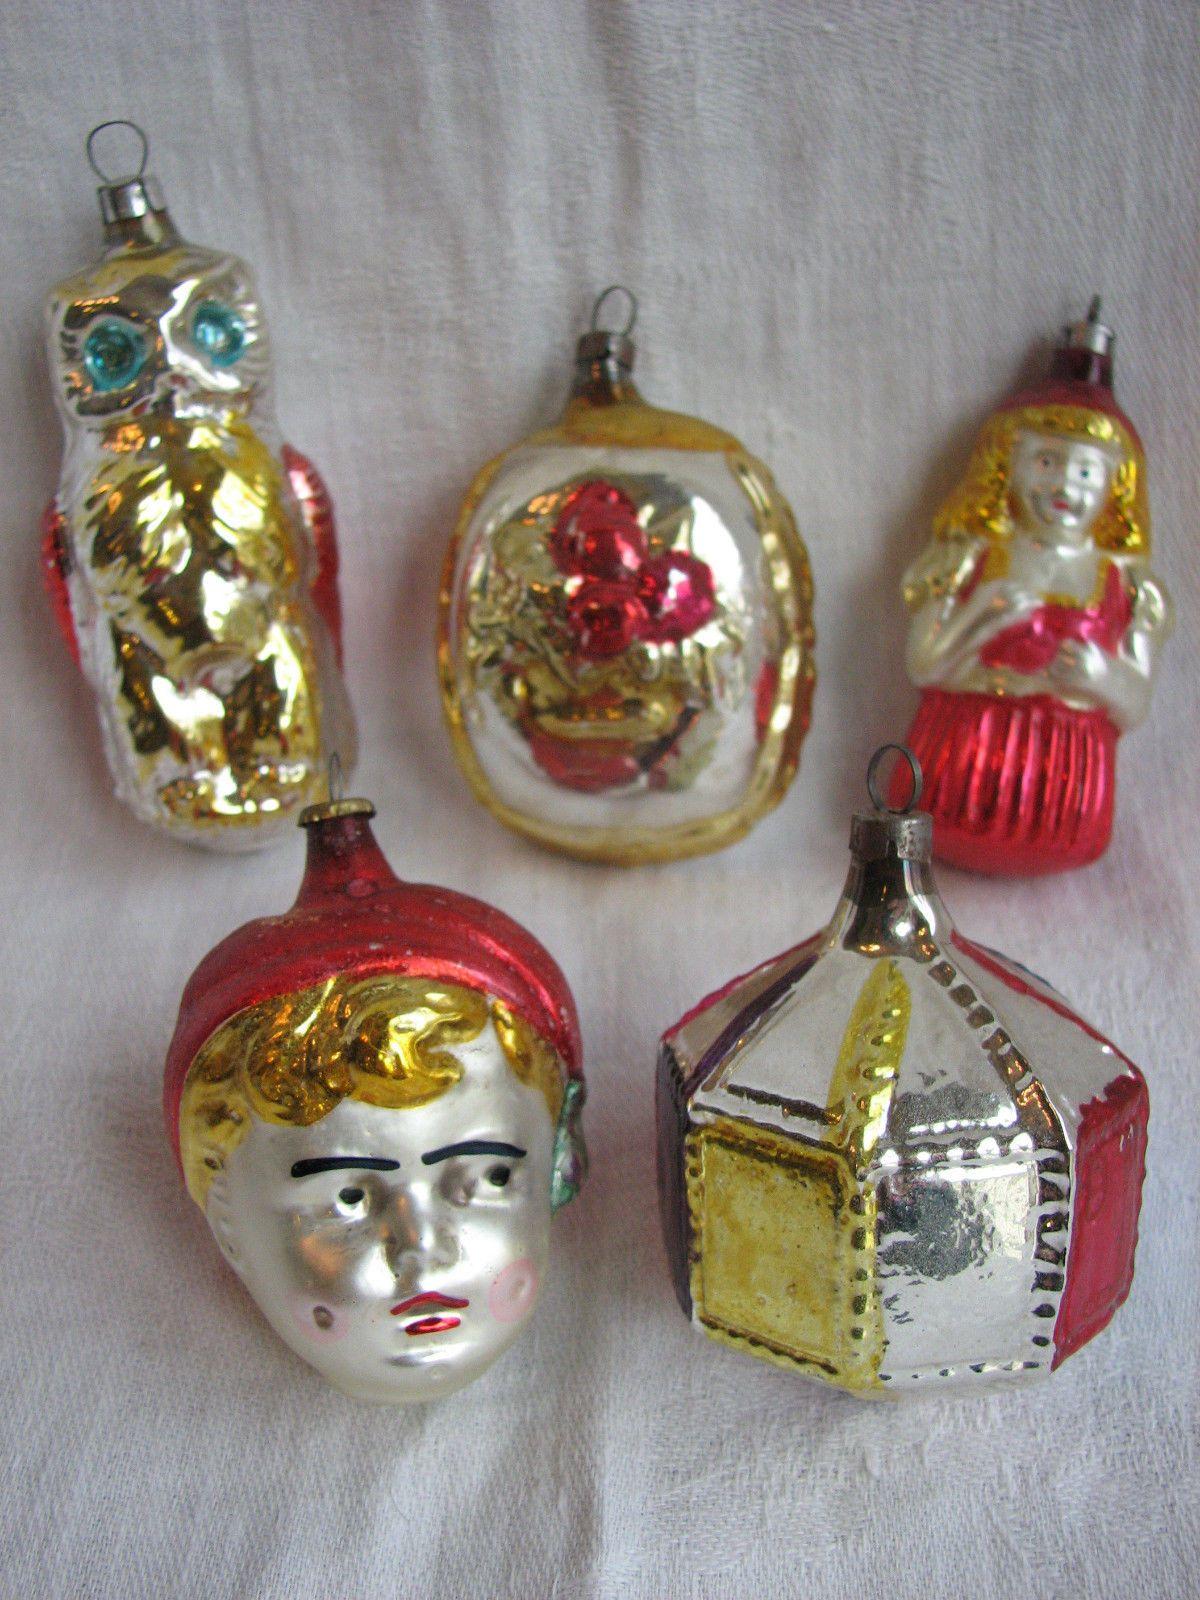 Vintage Mercury Glass Christmas Ornaments Czechoslovakia Germany Ow Vintage Mercury Glass Christmas Ornaments Vintage Christmas Decorations Christmas Ornaments